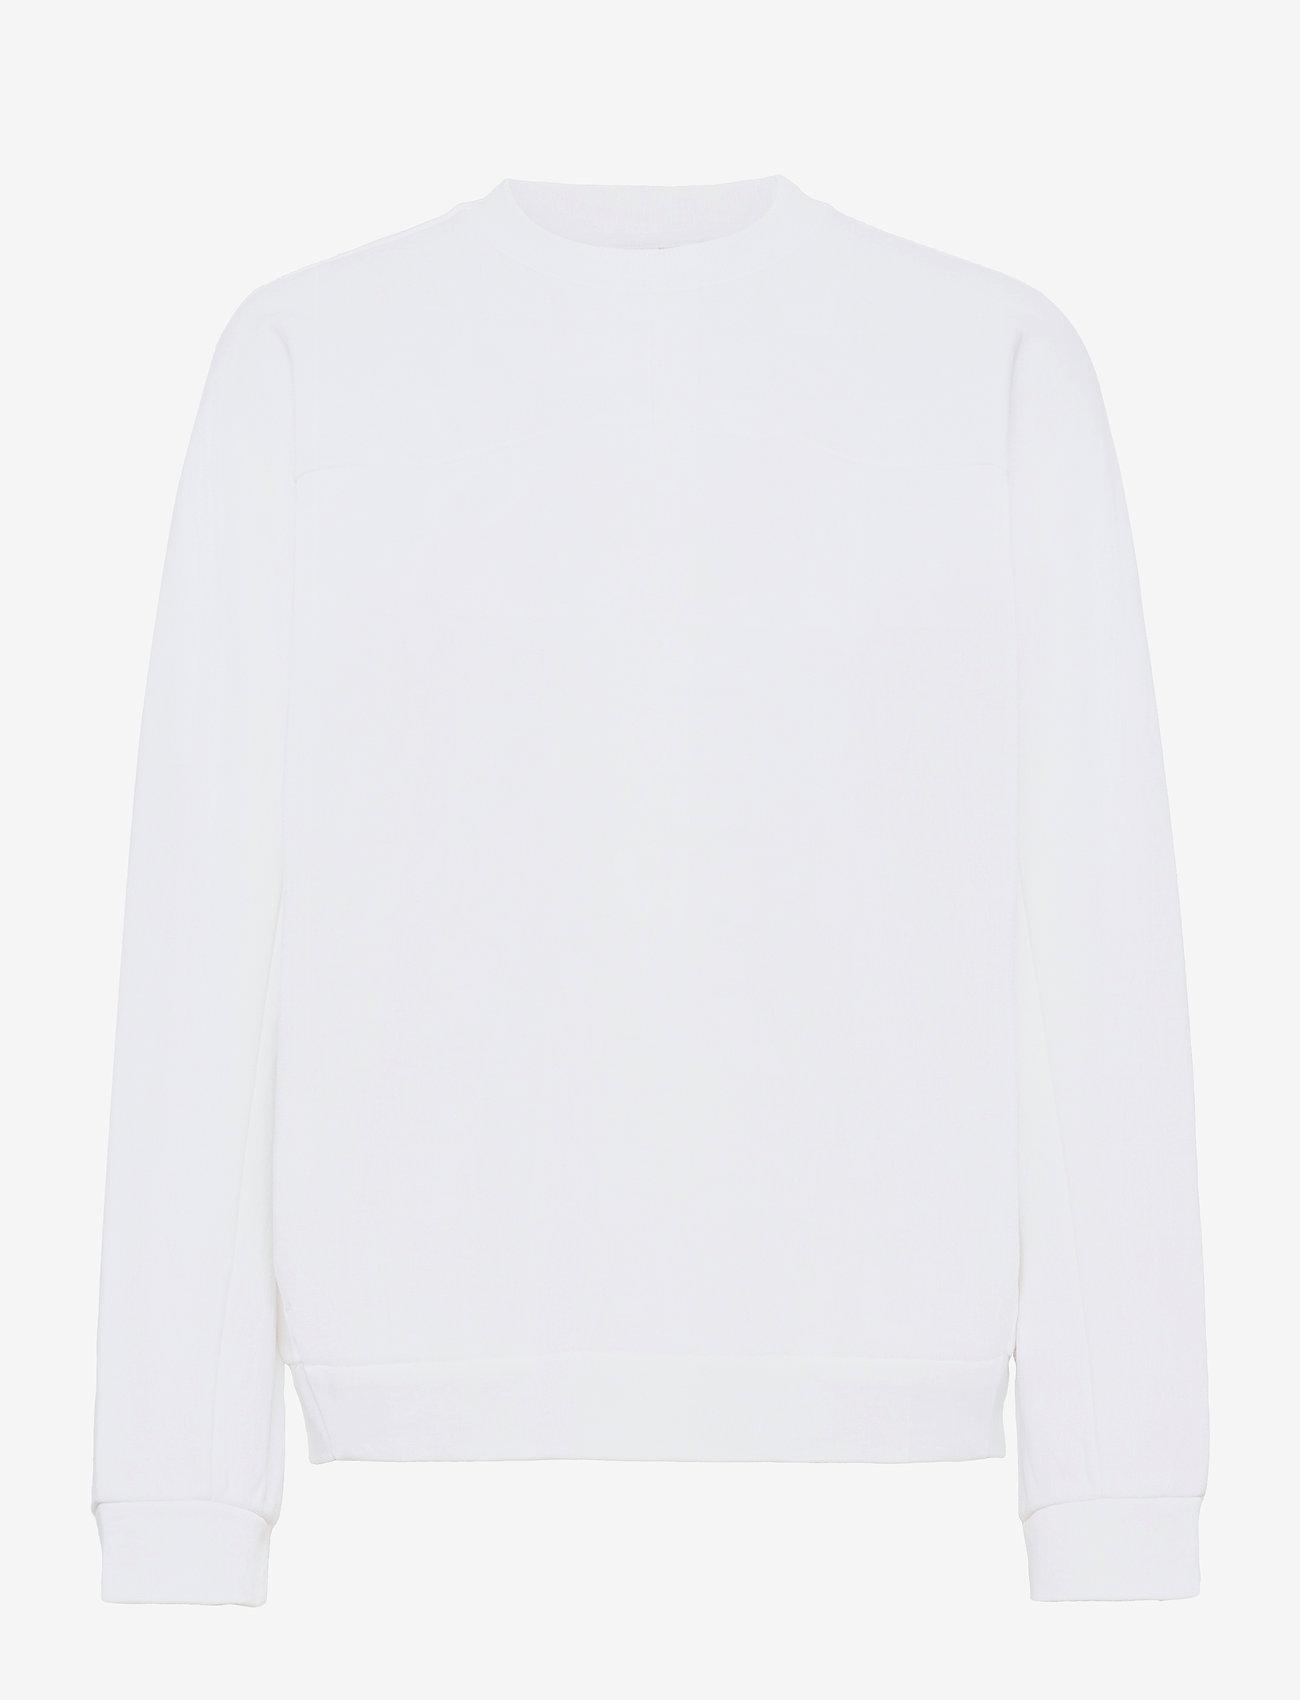 Max Mara Leisure - FRINE - sweatshirts & hoodies - optical white - 0